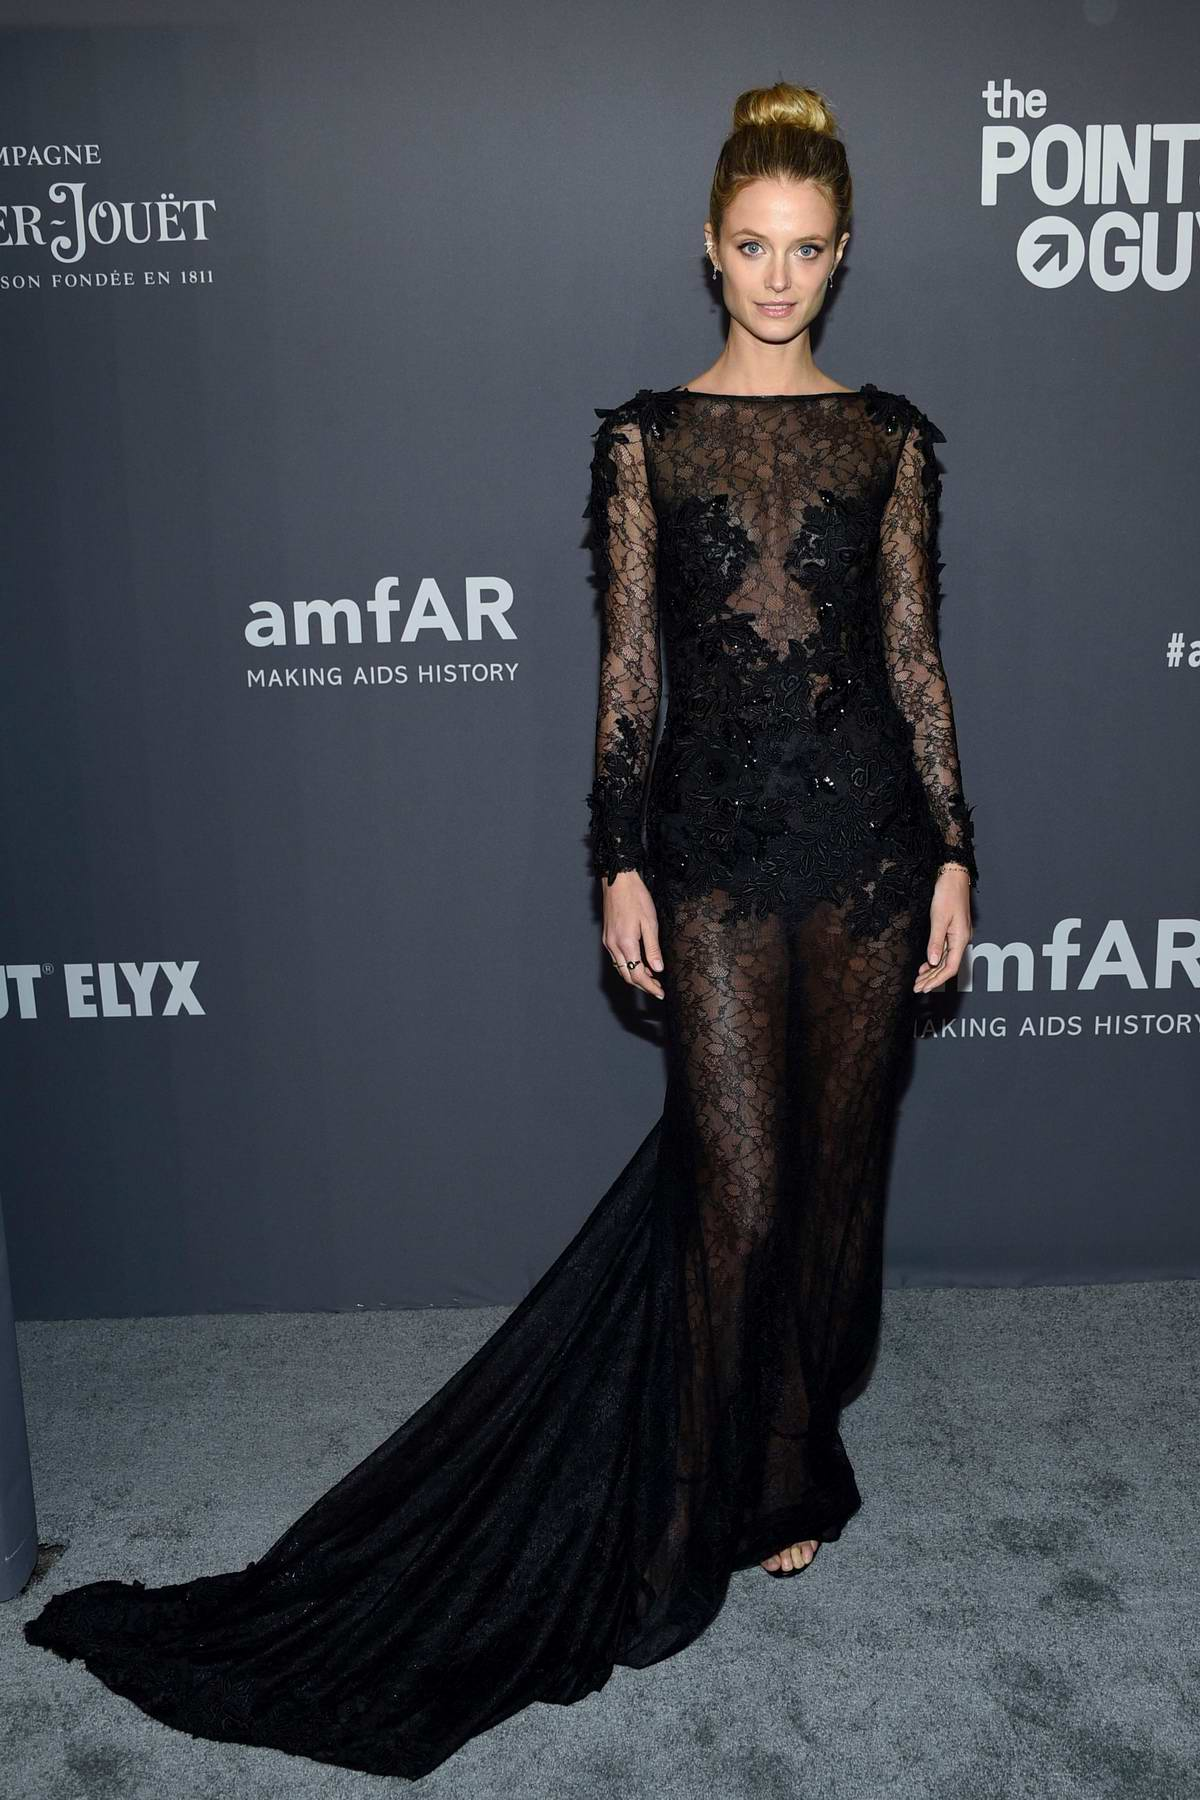 Kate Bock attends amfAR New York Gala 2019 at Cipriani Wall Street in New York City